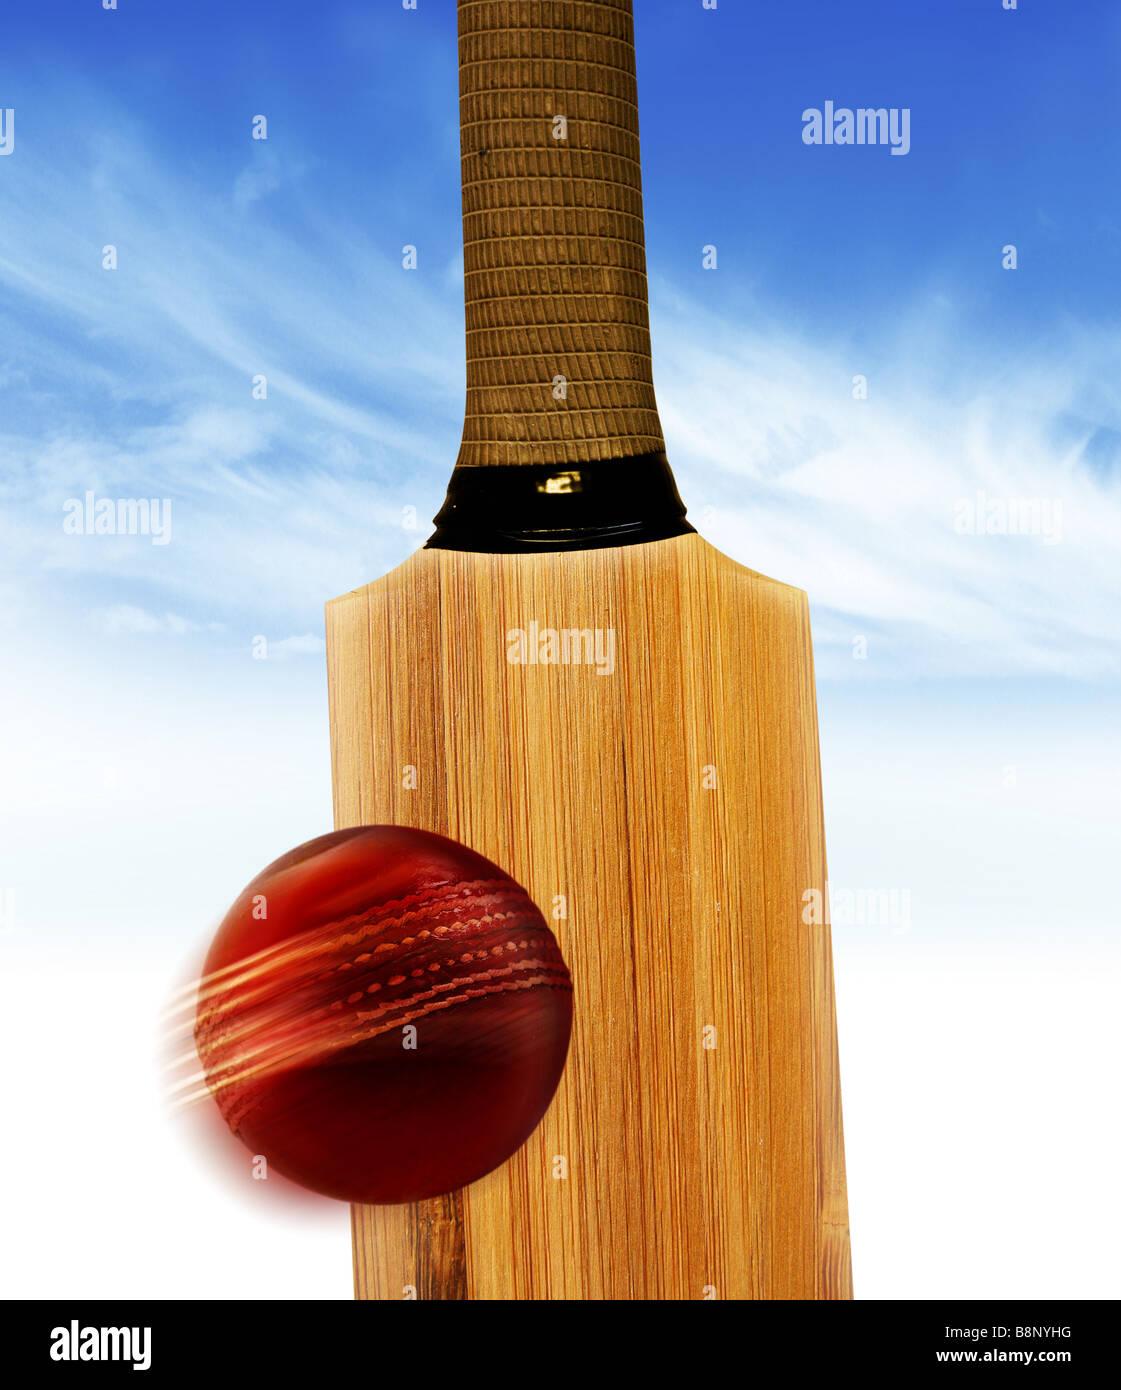 Cricket bat and cricket ball - Stock Image